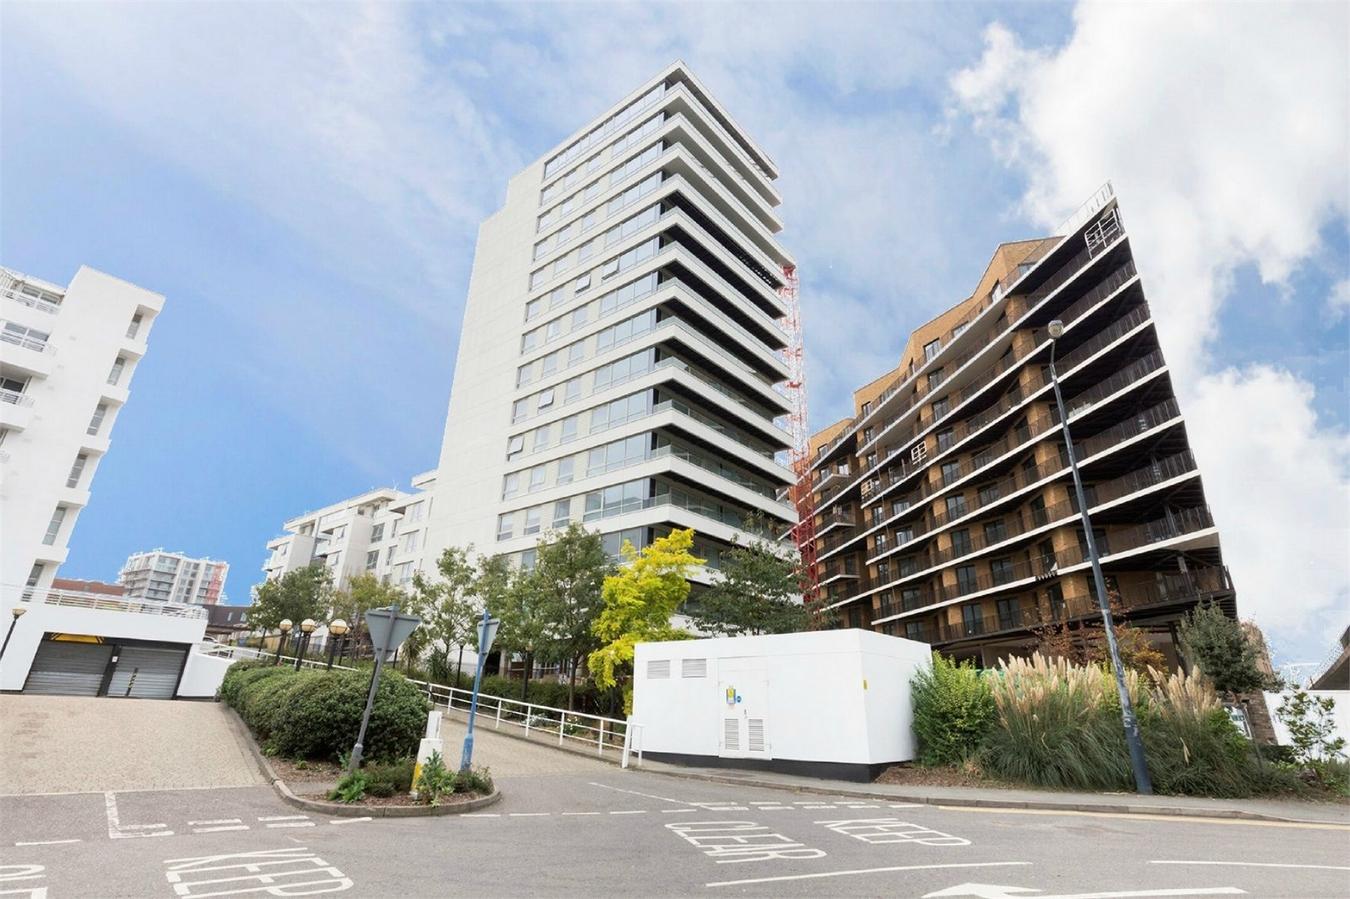 1 Bedroom Flat For Sale Corsair Meridian Building Royal Wharf E London E16 2pf